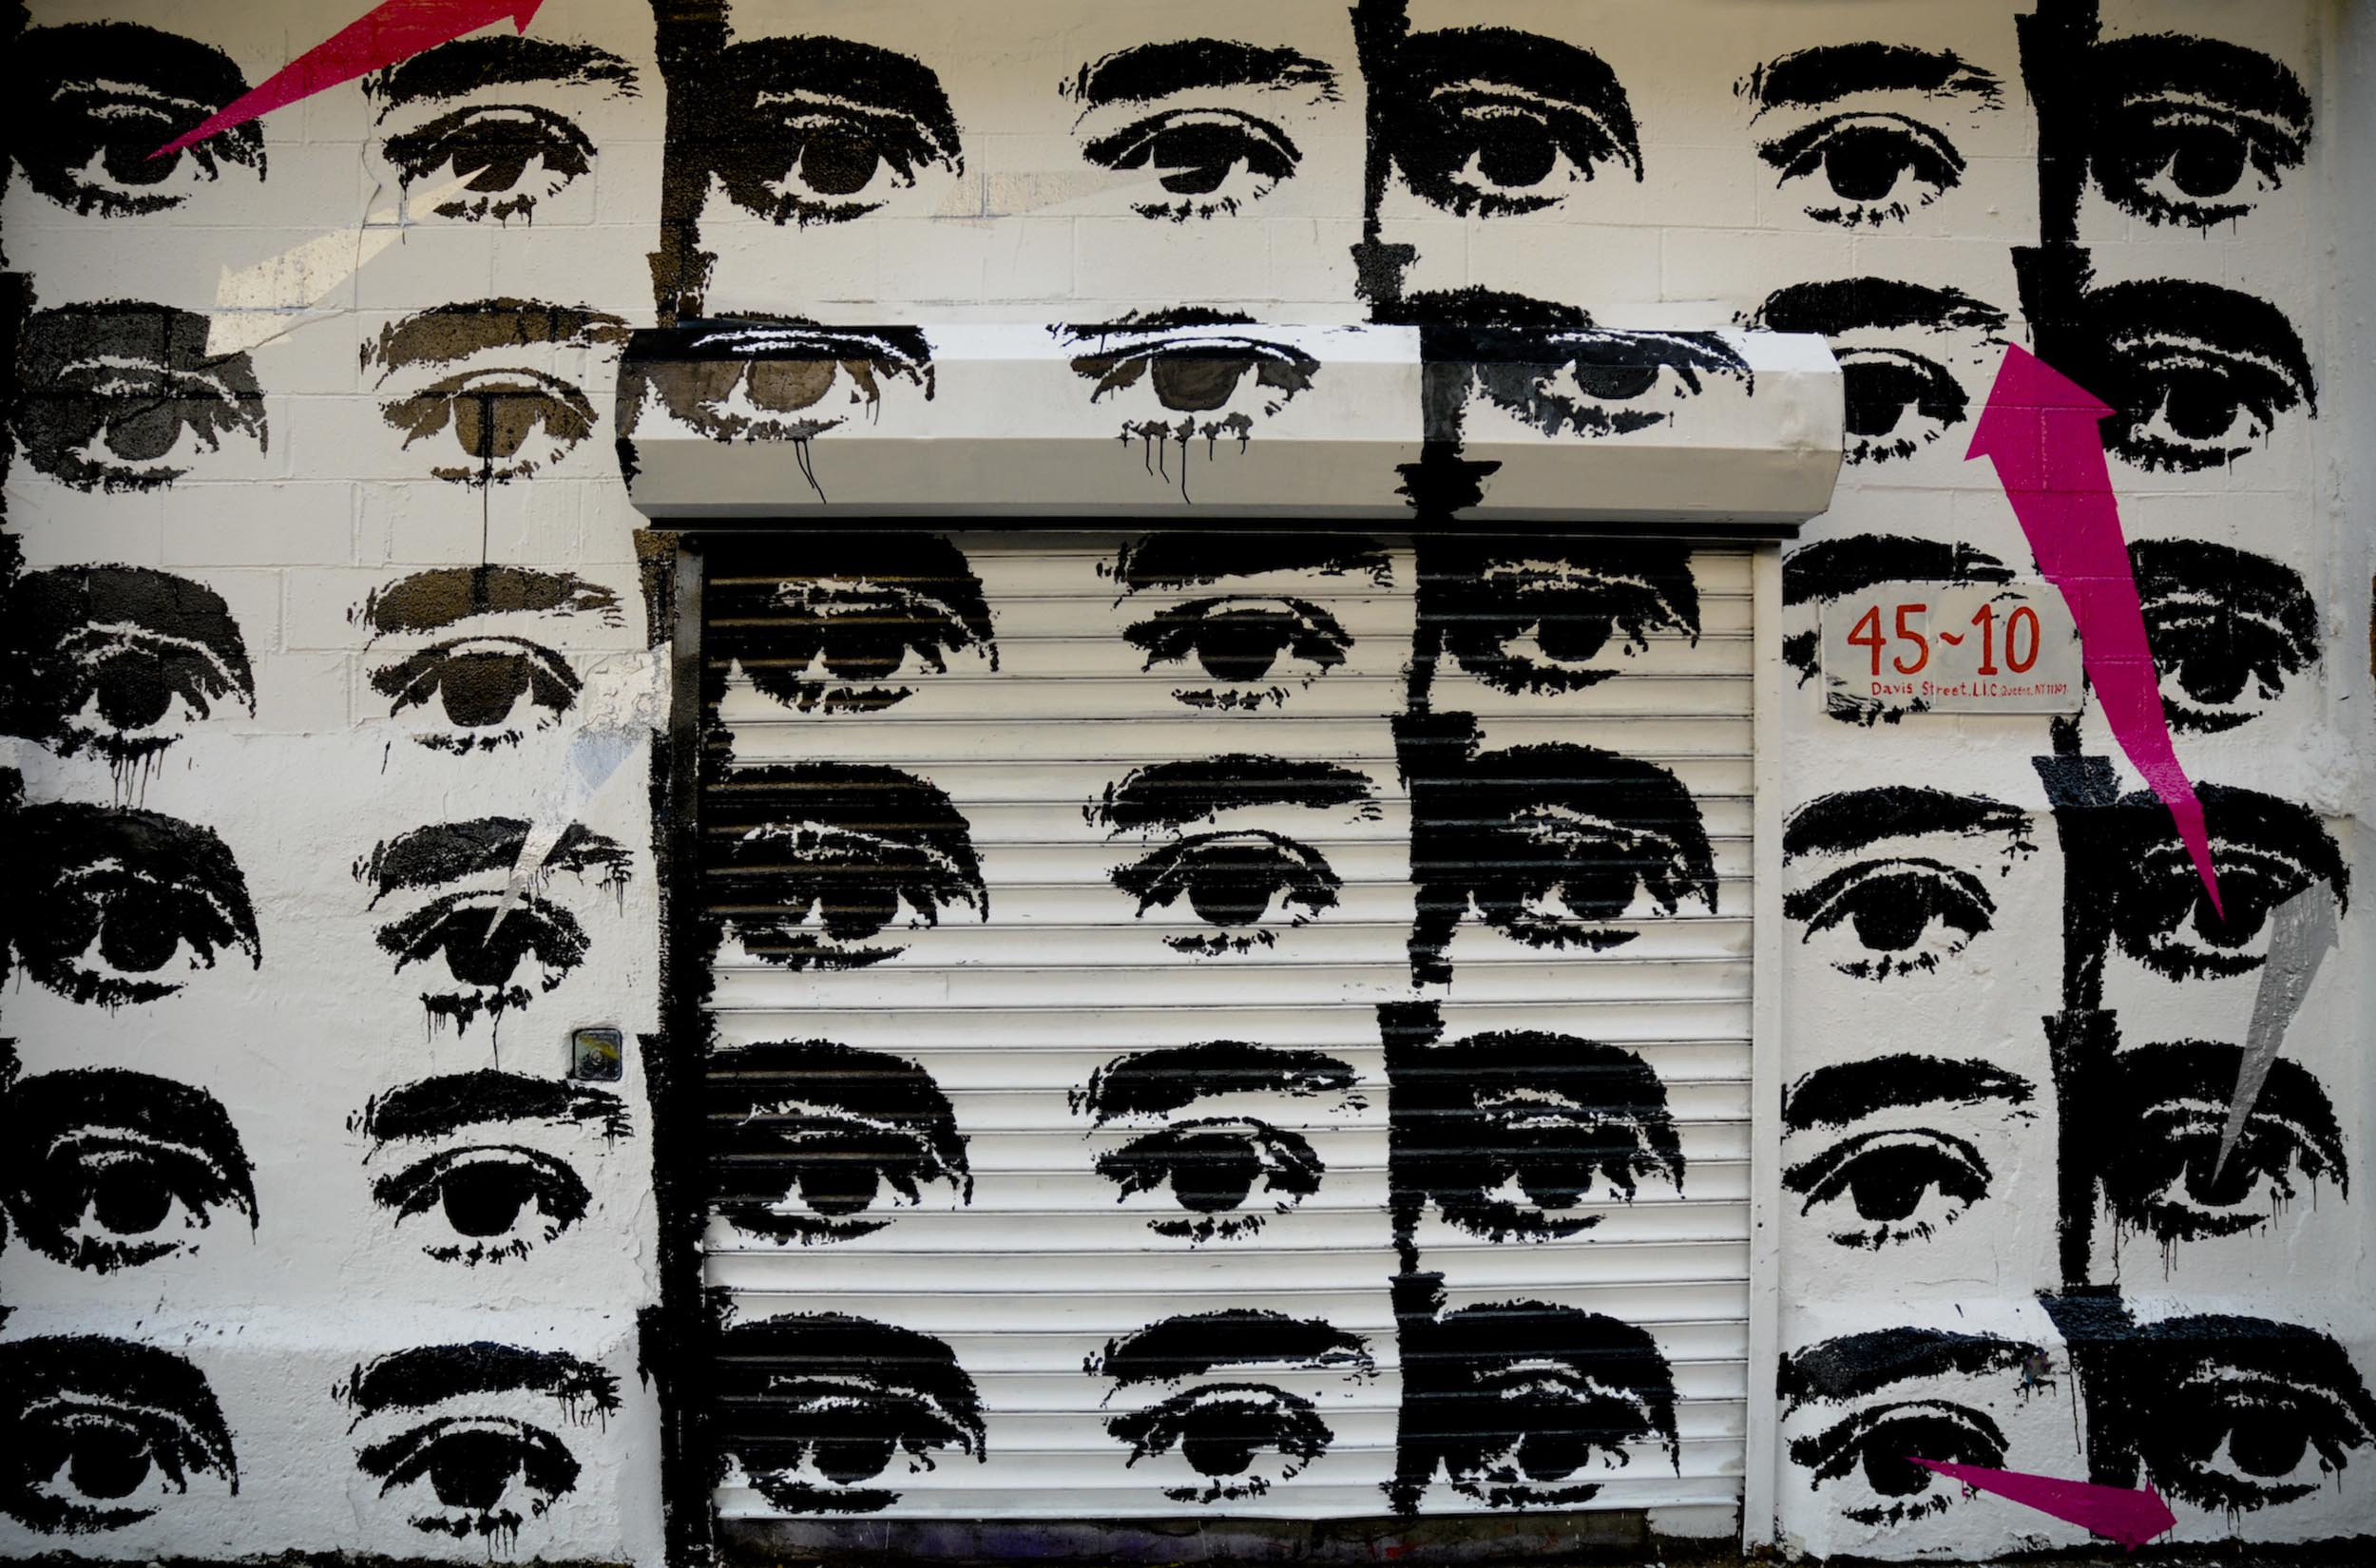 Eve-Biddle-Artworks-Eyes-at-5-pointz-2012-02